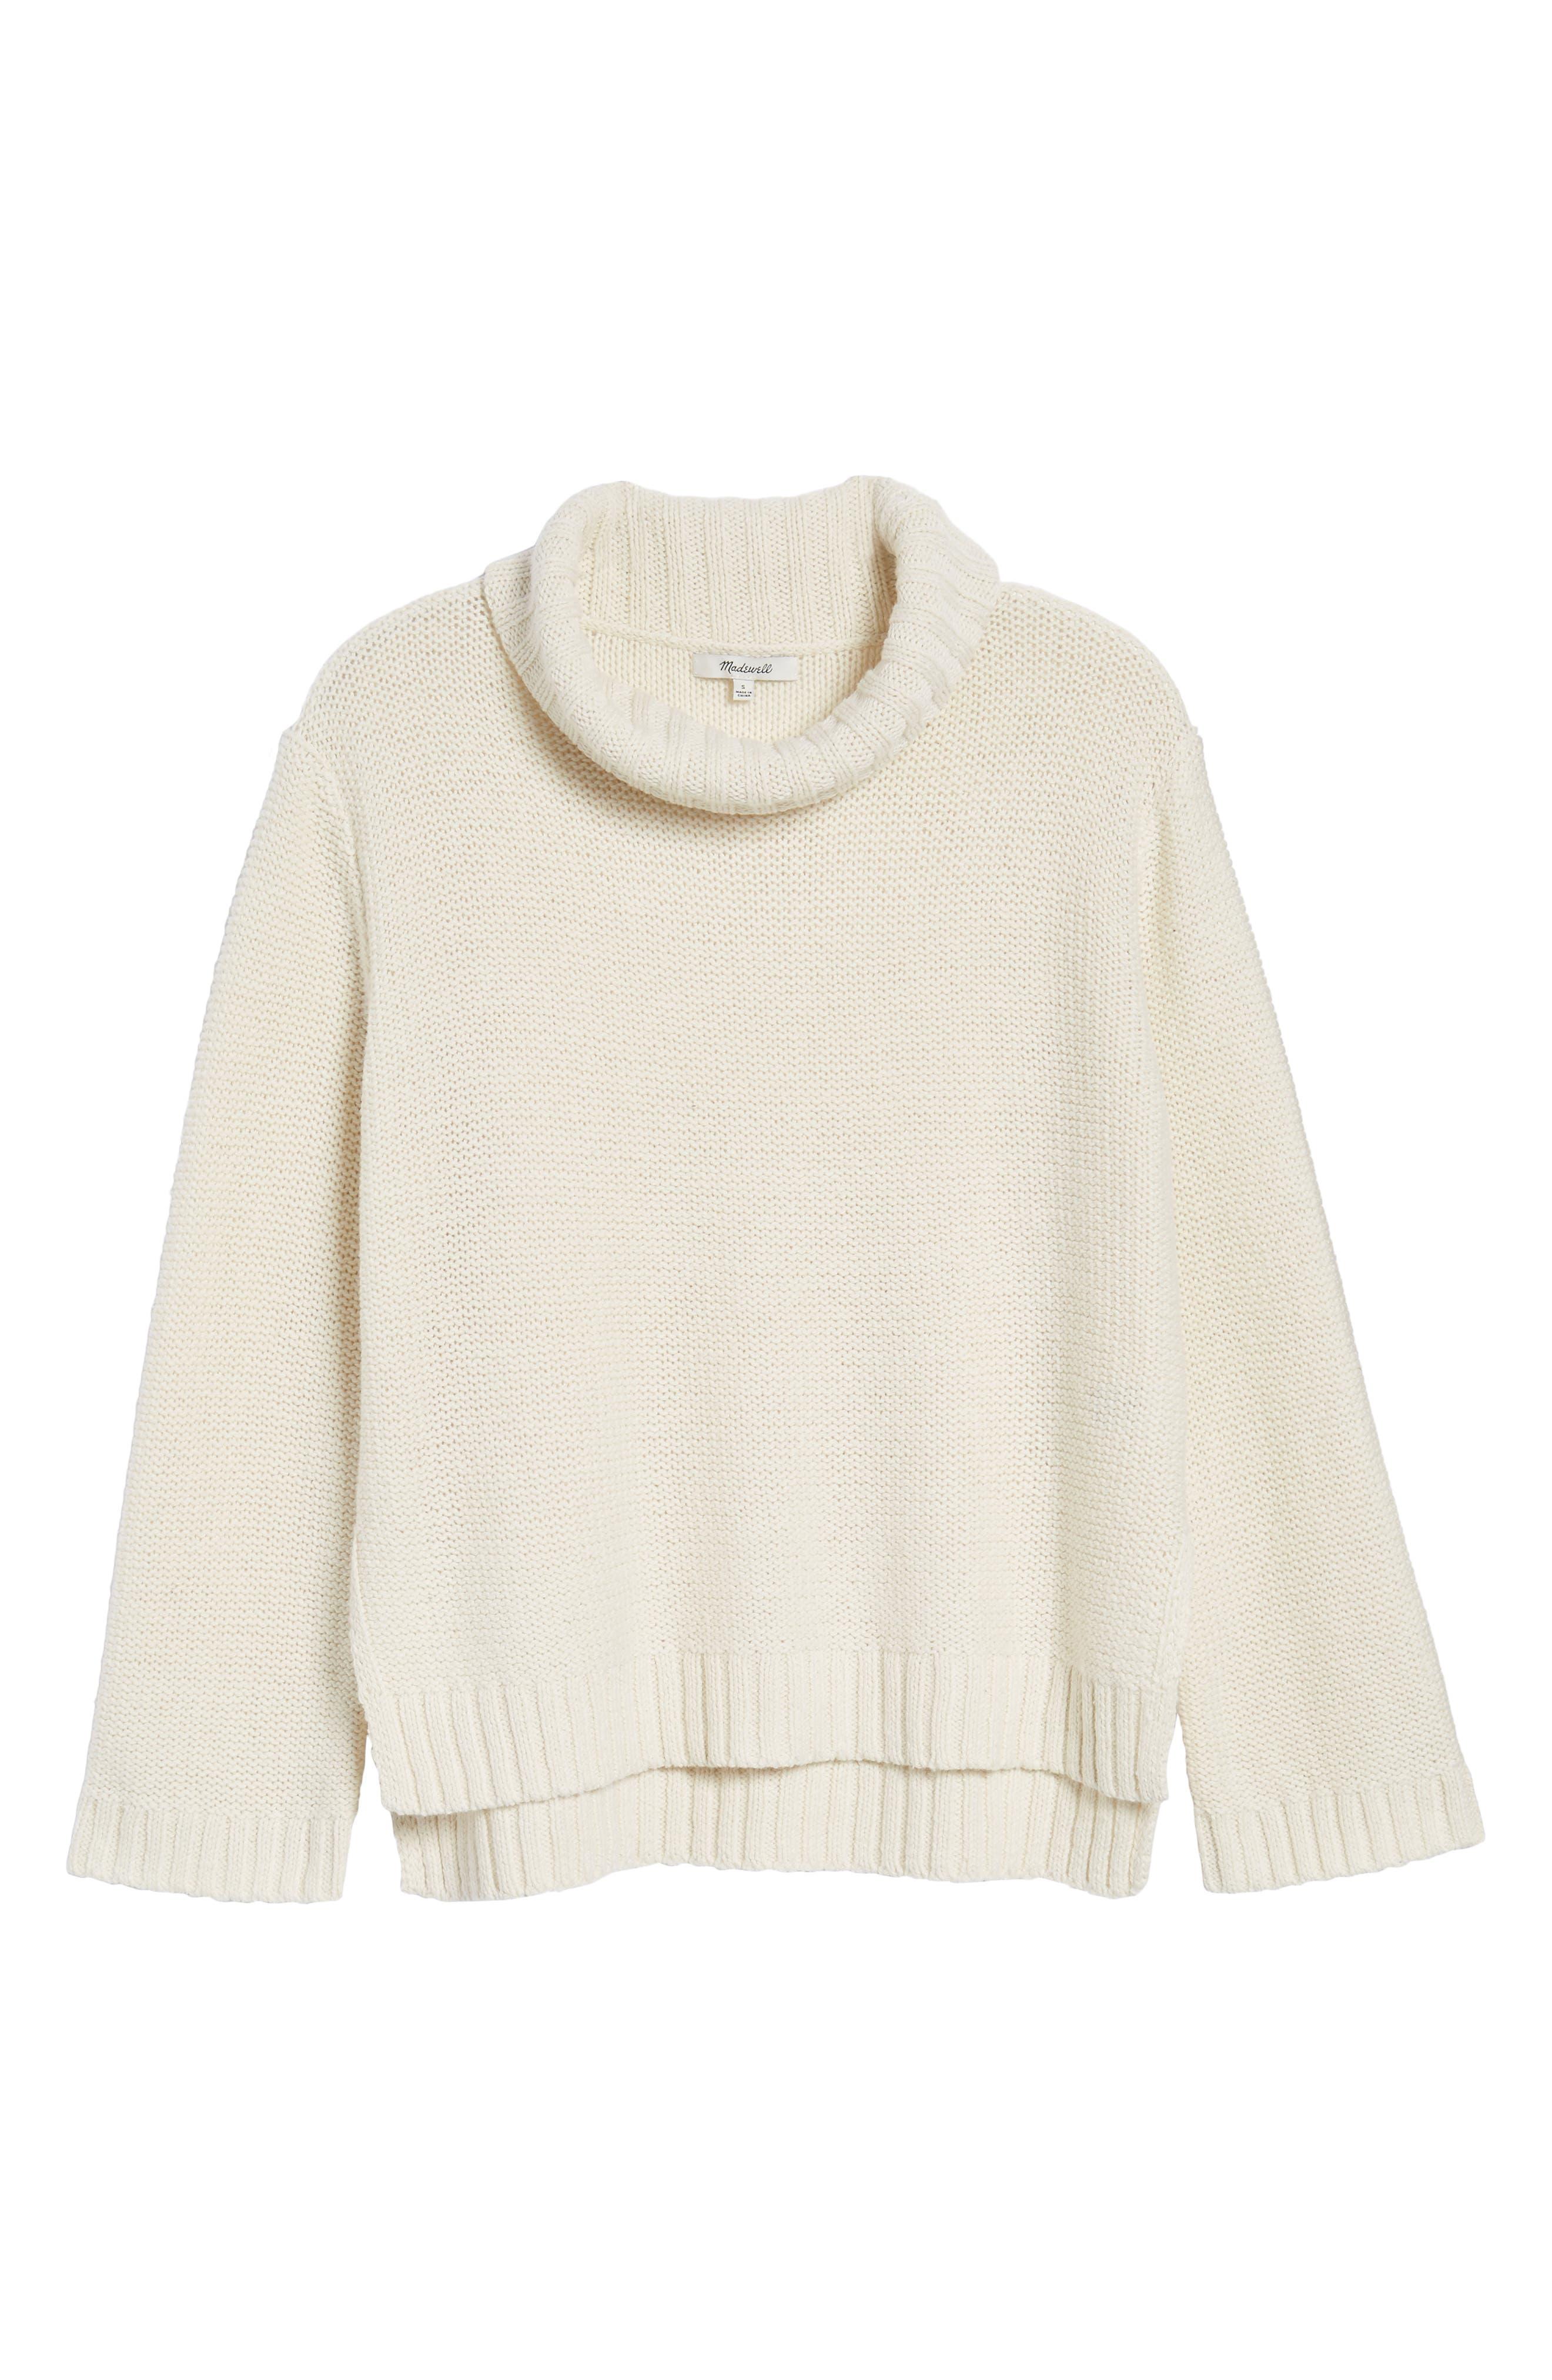 Flecked Turtleneck Sweater,                             Alternate thumbnail 6, color,                             100